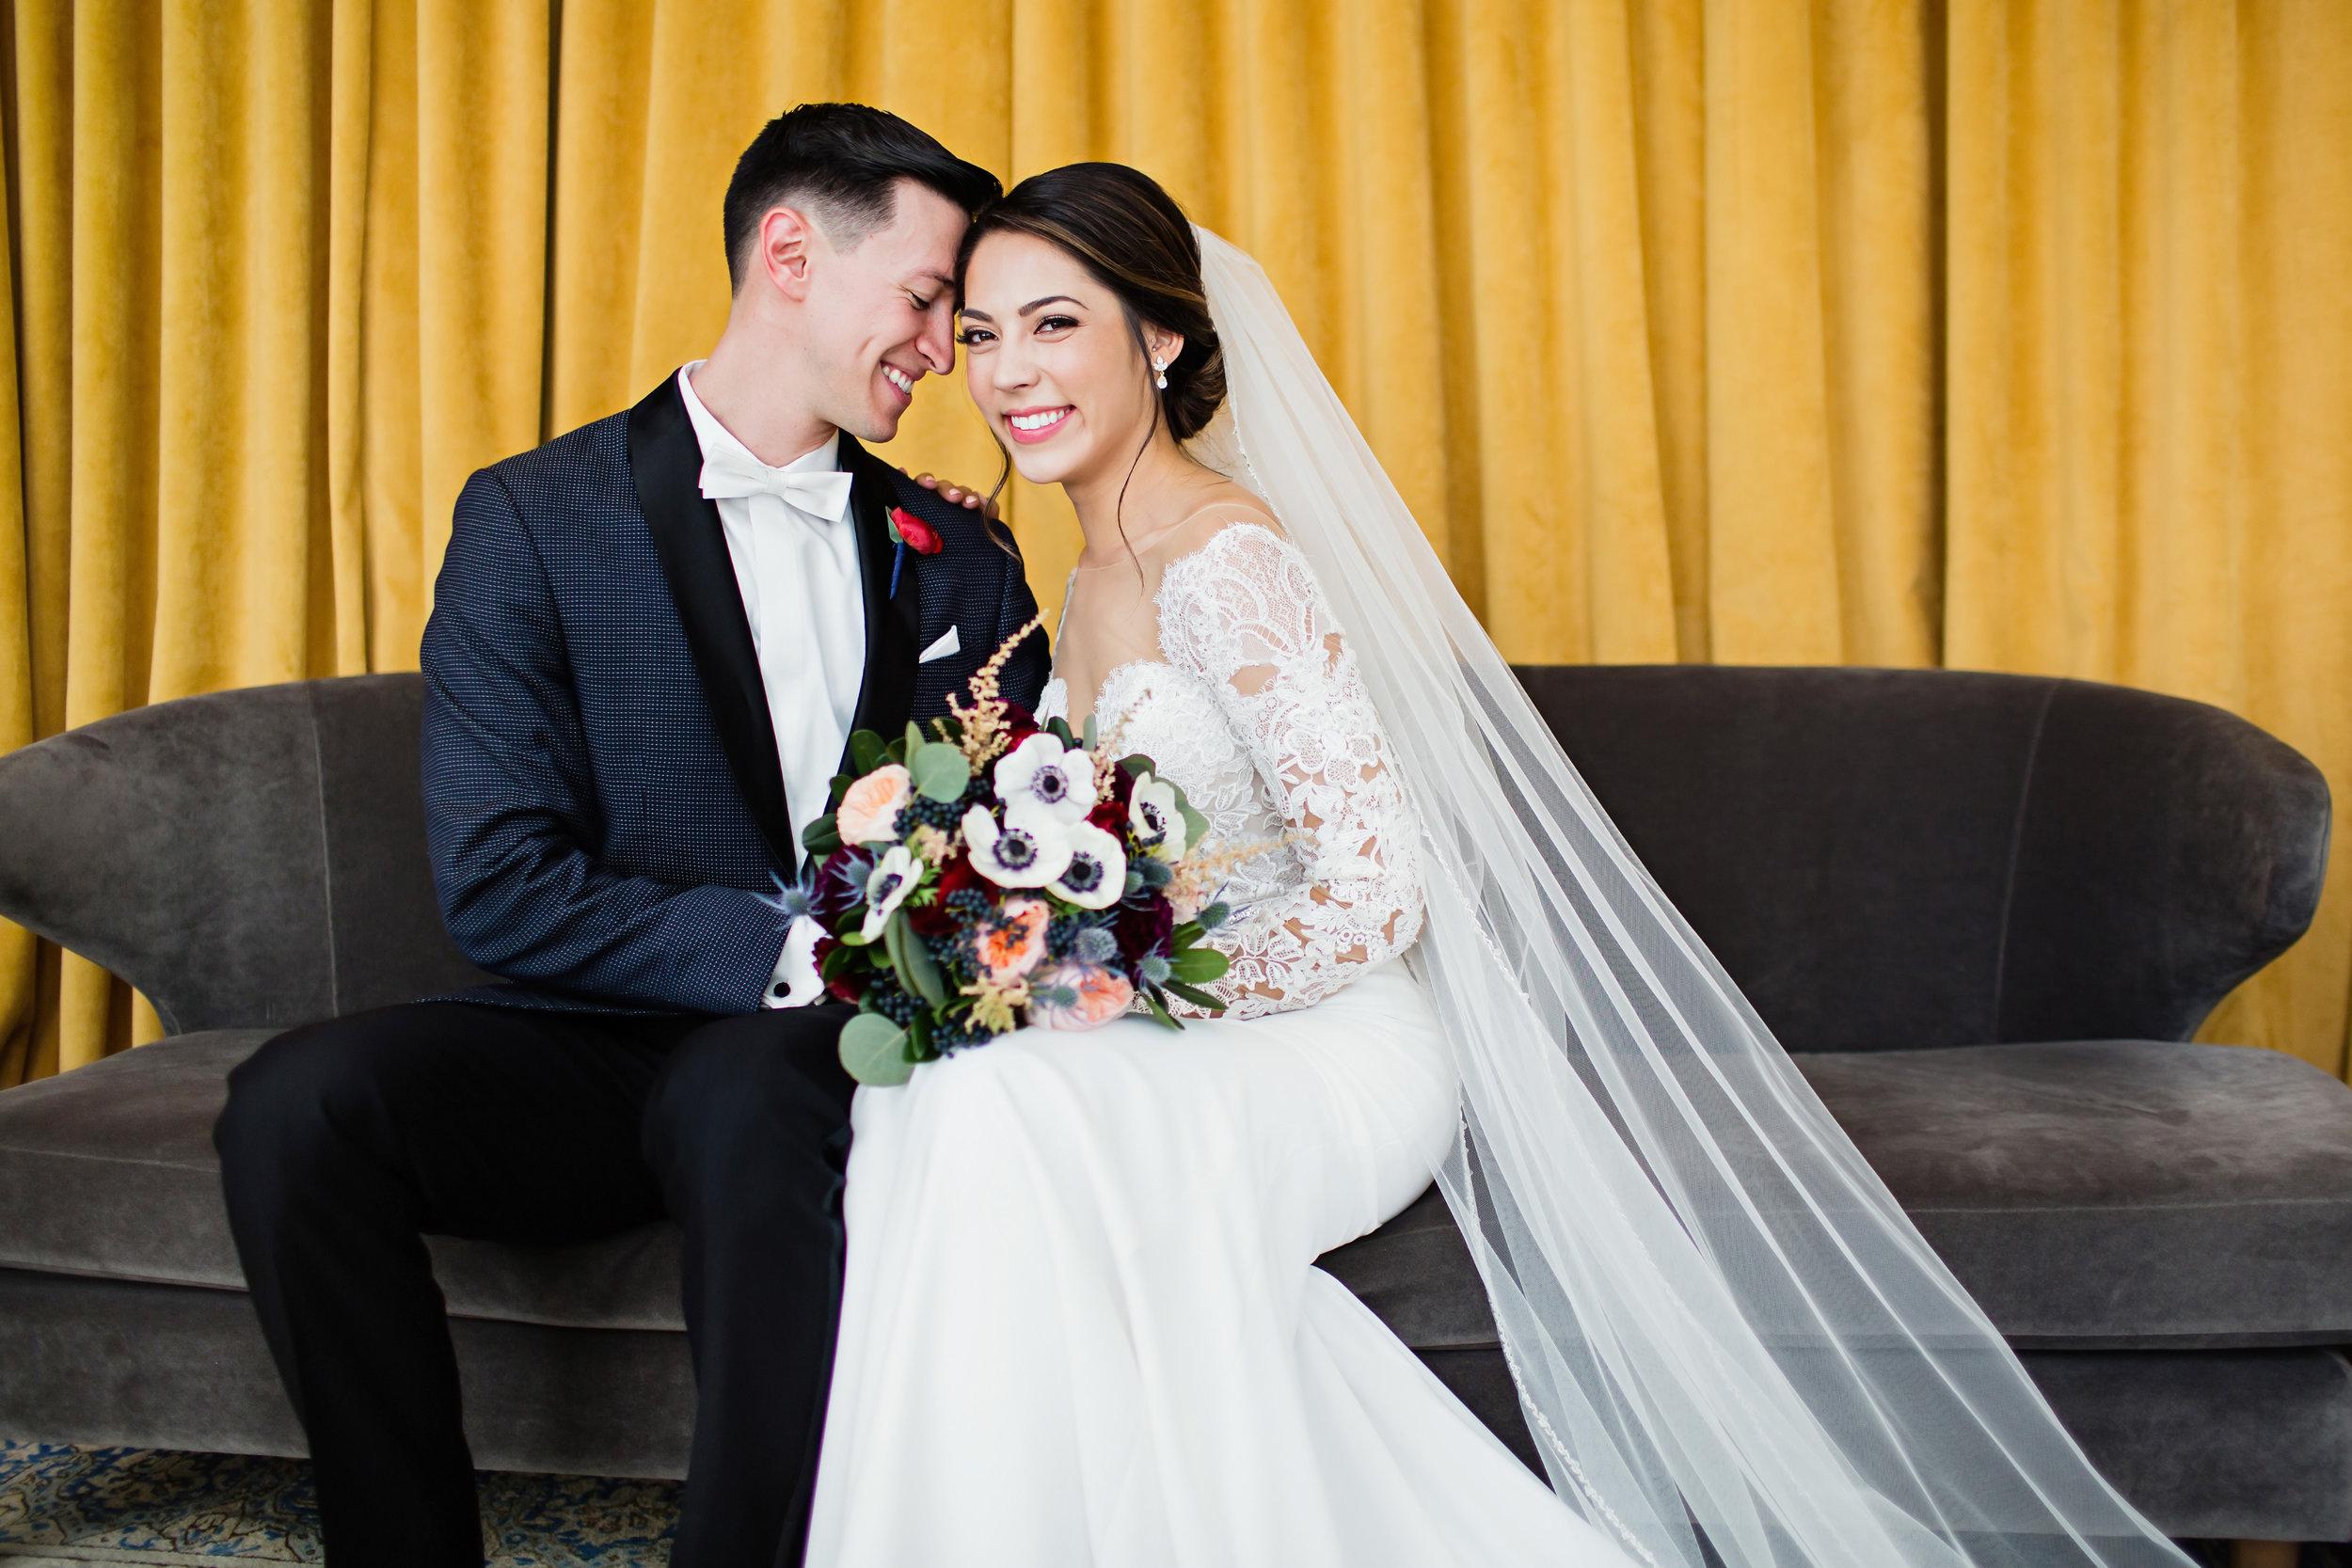 stylish-wedding-photography-windsor-toronto-ontario-wedding-photographer-winery-eryn-shea-photography-09.jpg